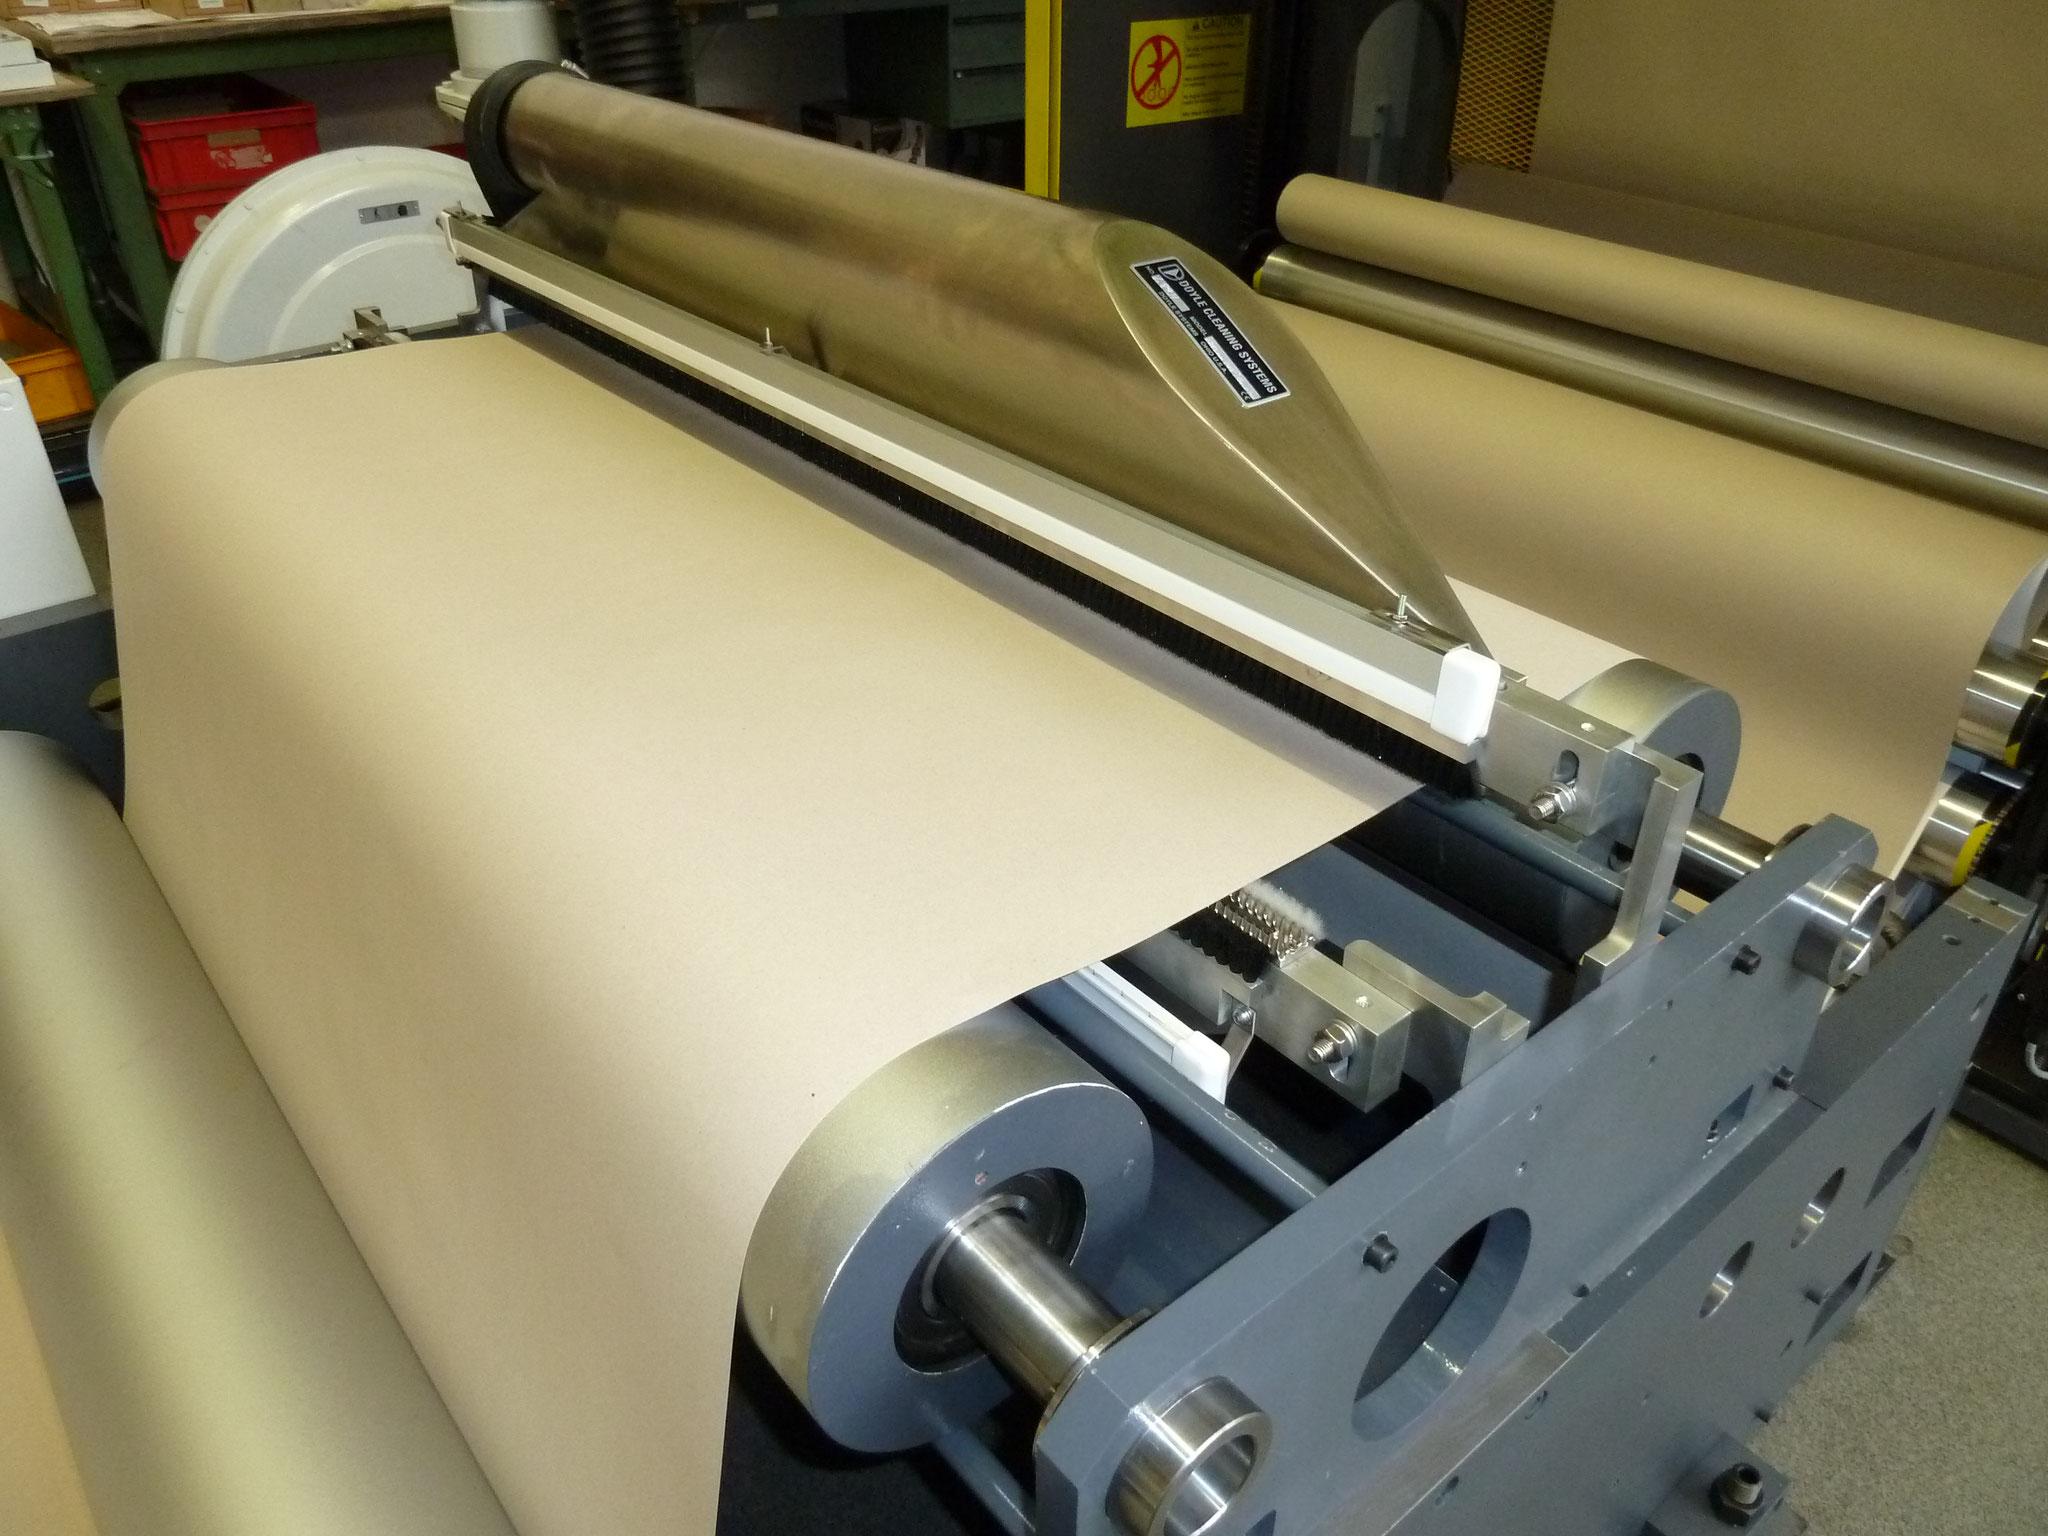 Goebel VSOP 1250 mm Liquid Packaging